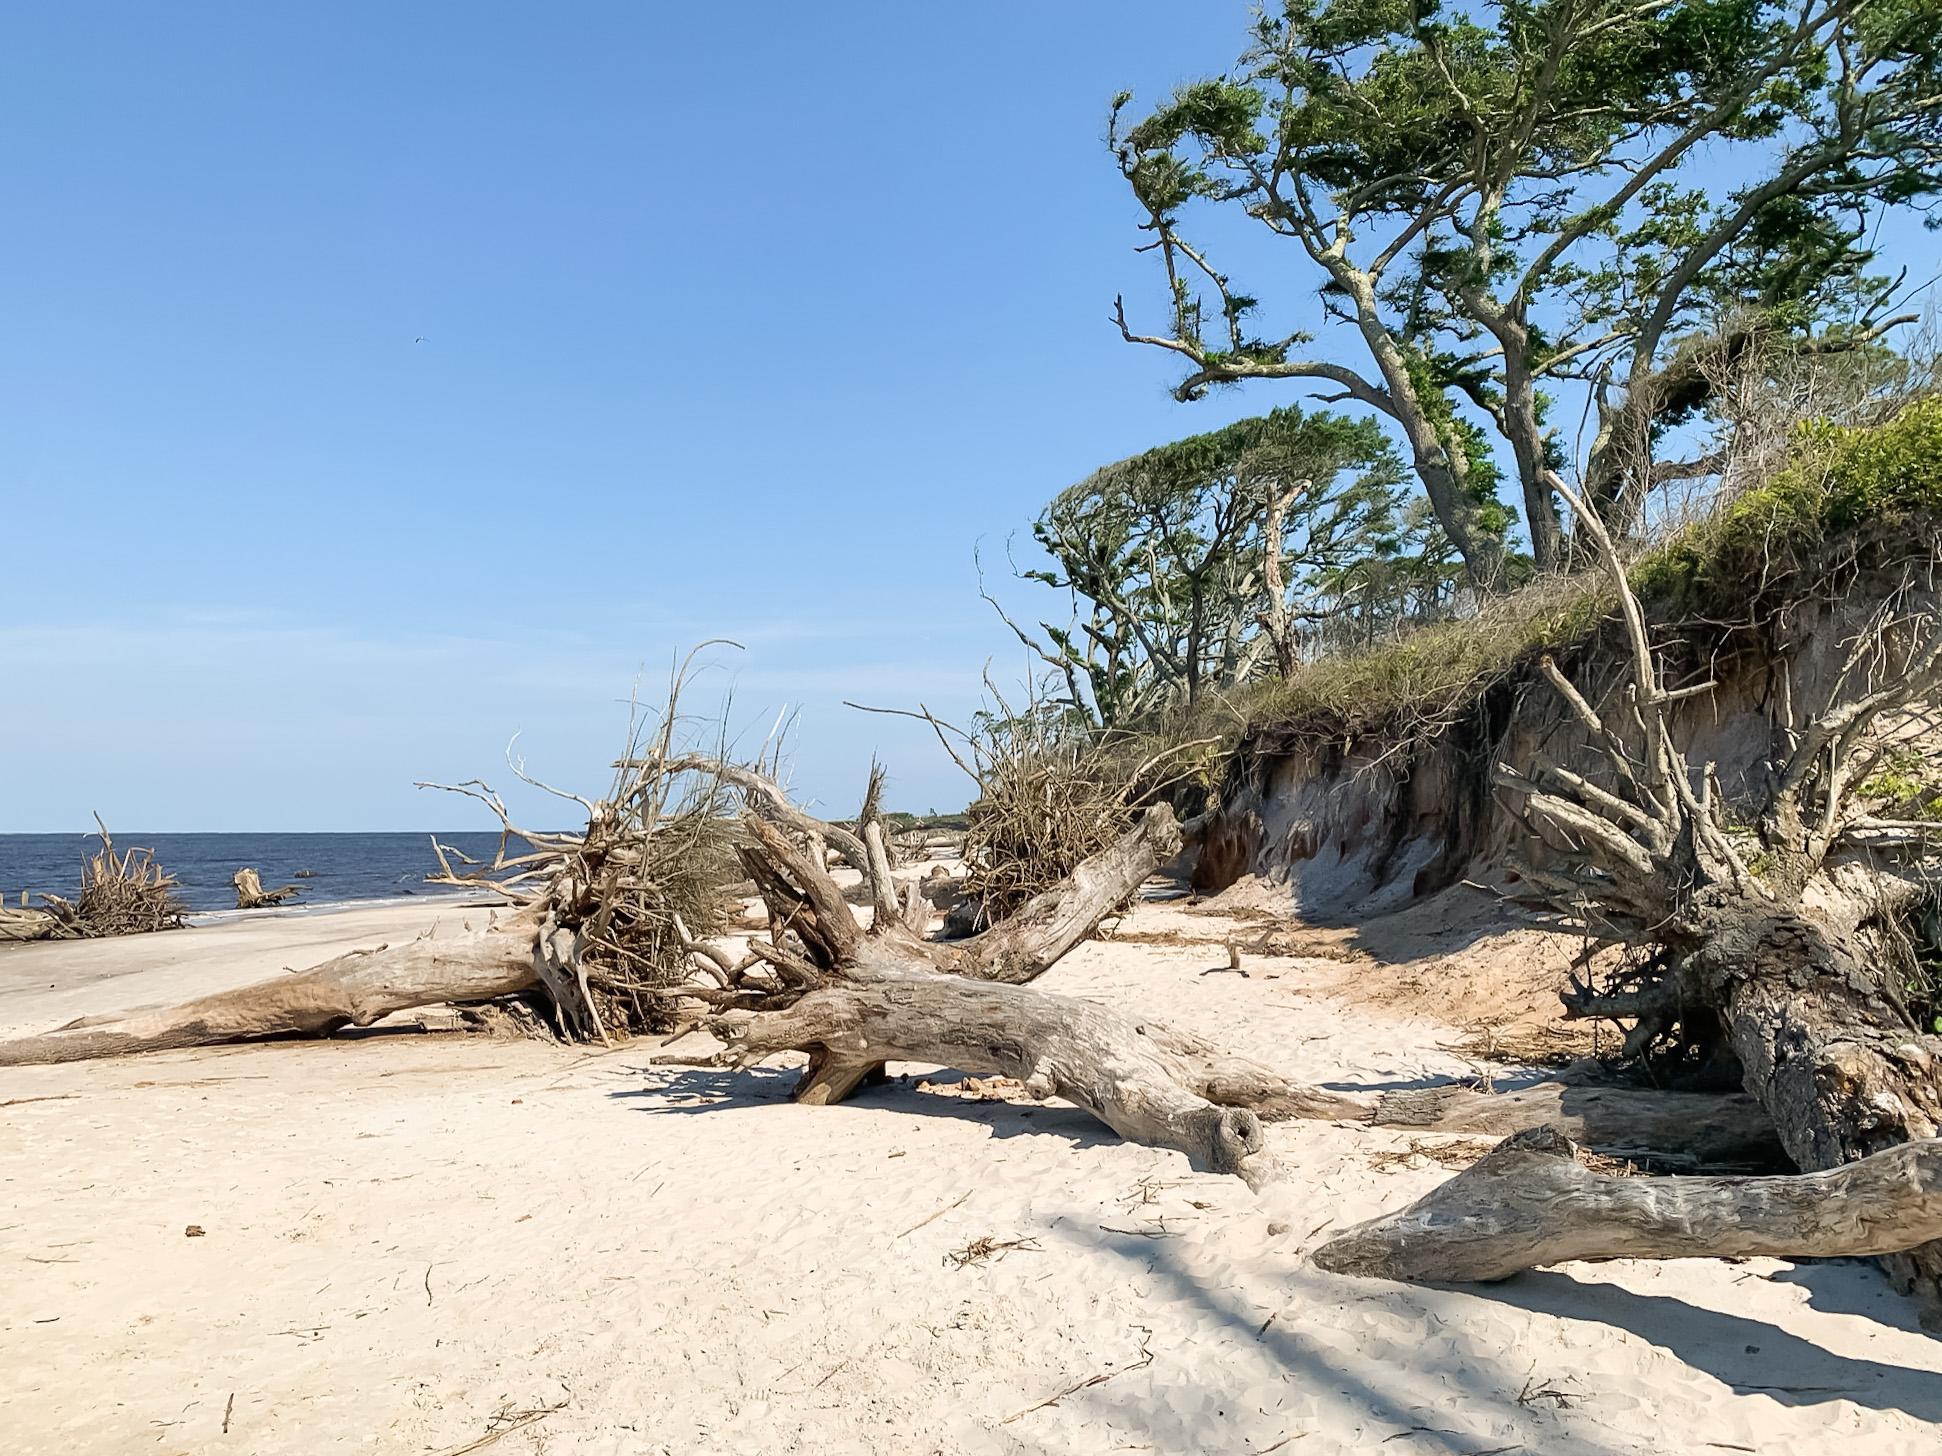 Boneyard Beach in Florida